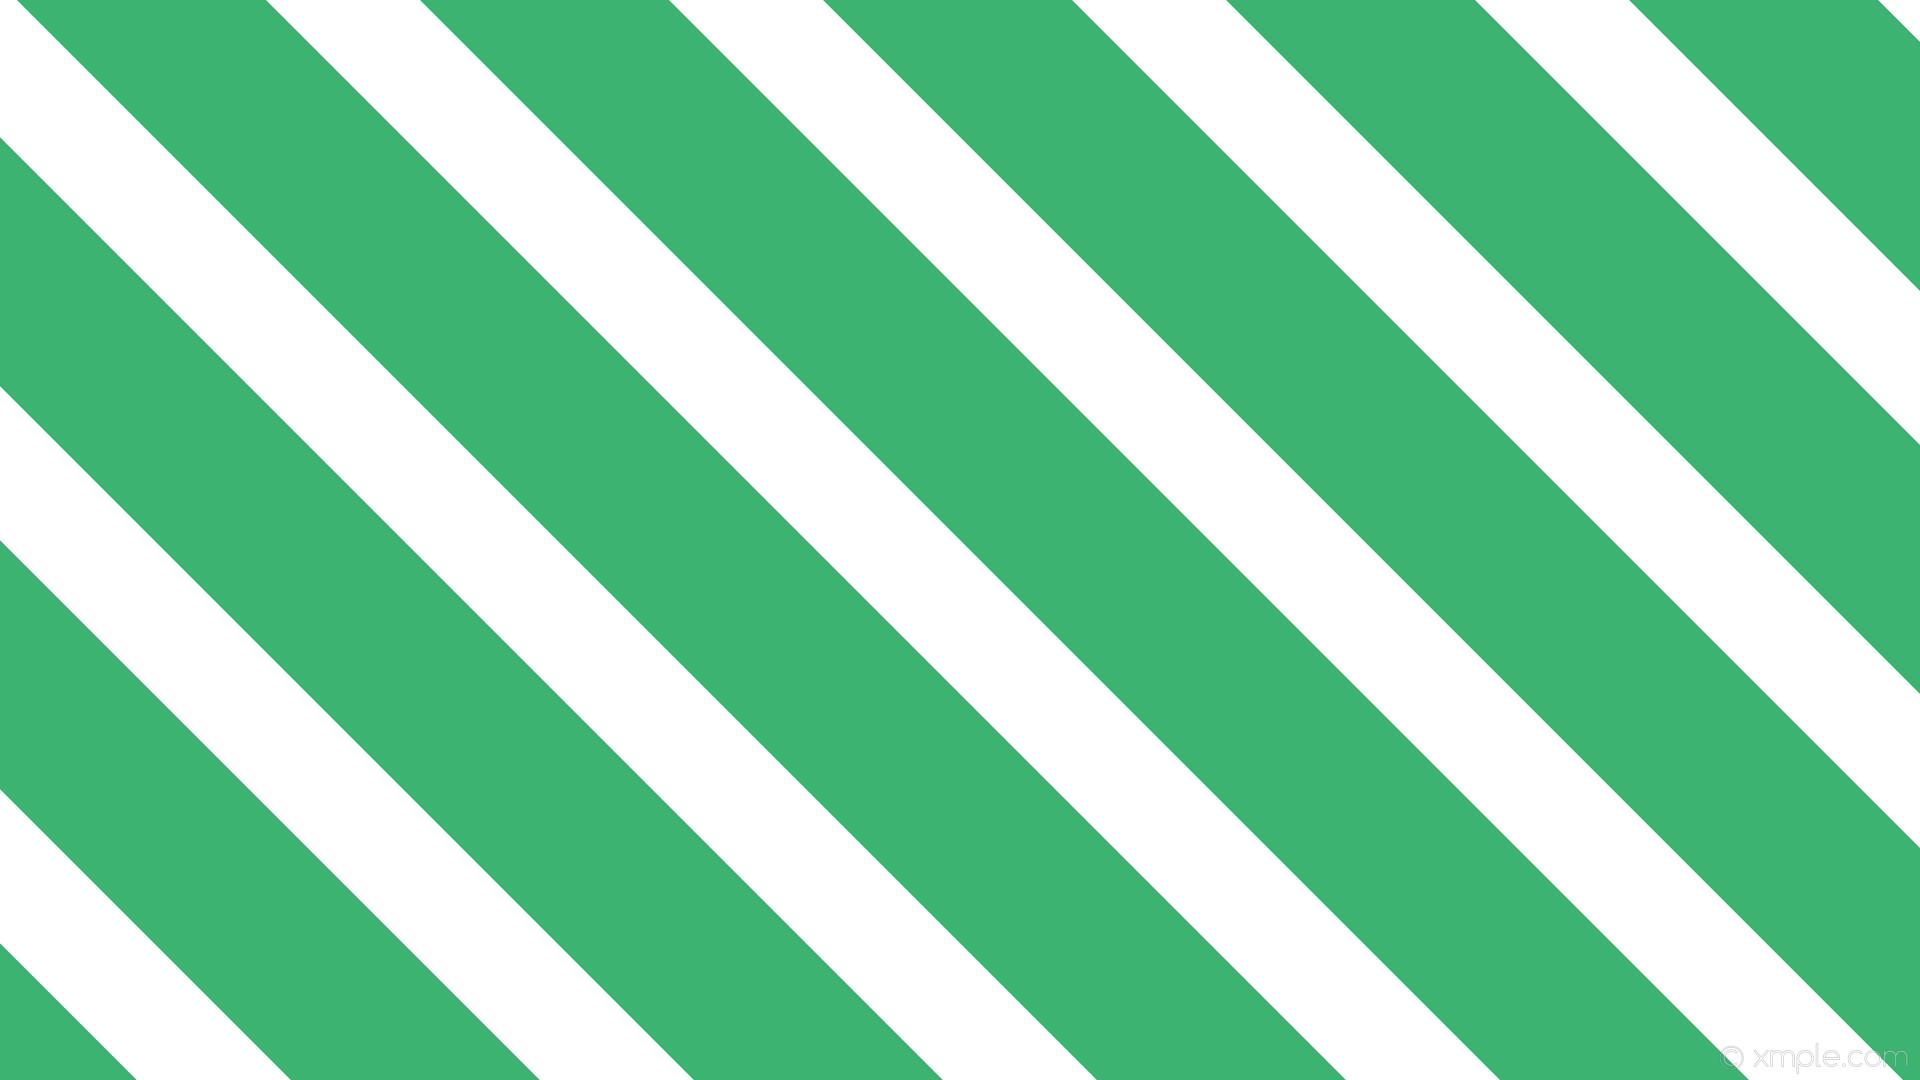 wallpaper white lines green streaks stripes medium sea green #ffffff  #3cb371 diagonal 315°